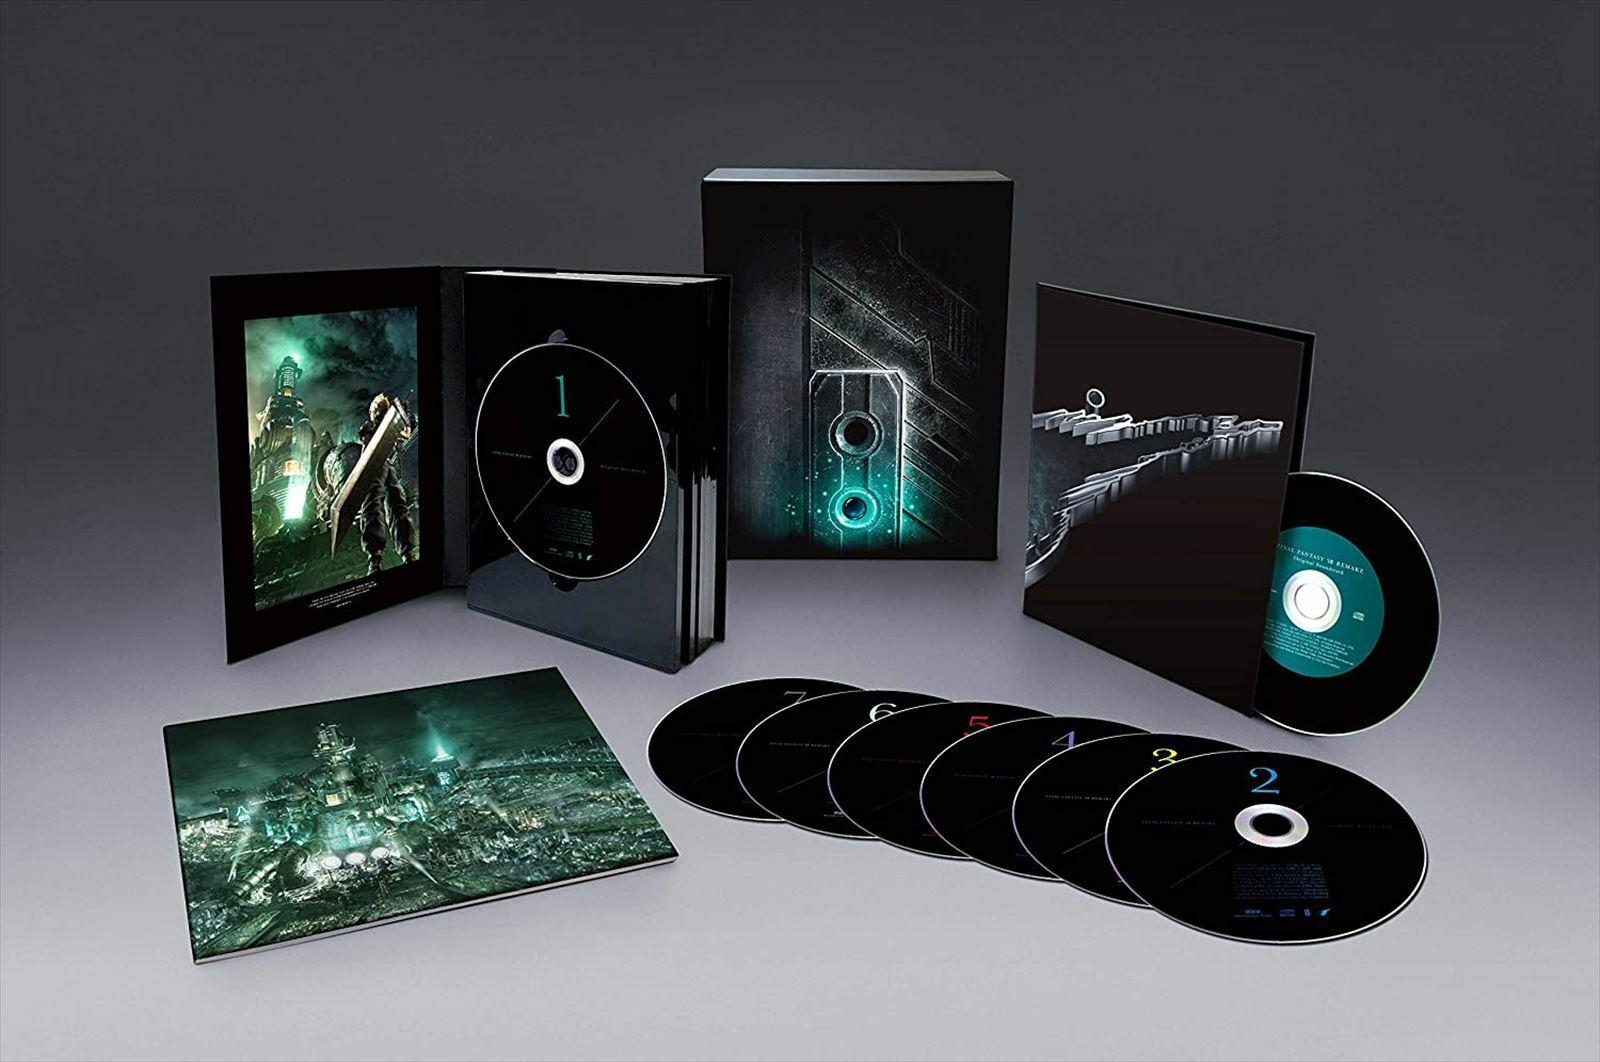 RARE FF7 FINAL FANTASY VII REMAKE Original Soundtrack CD Special edit version